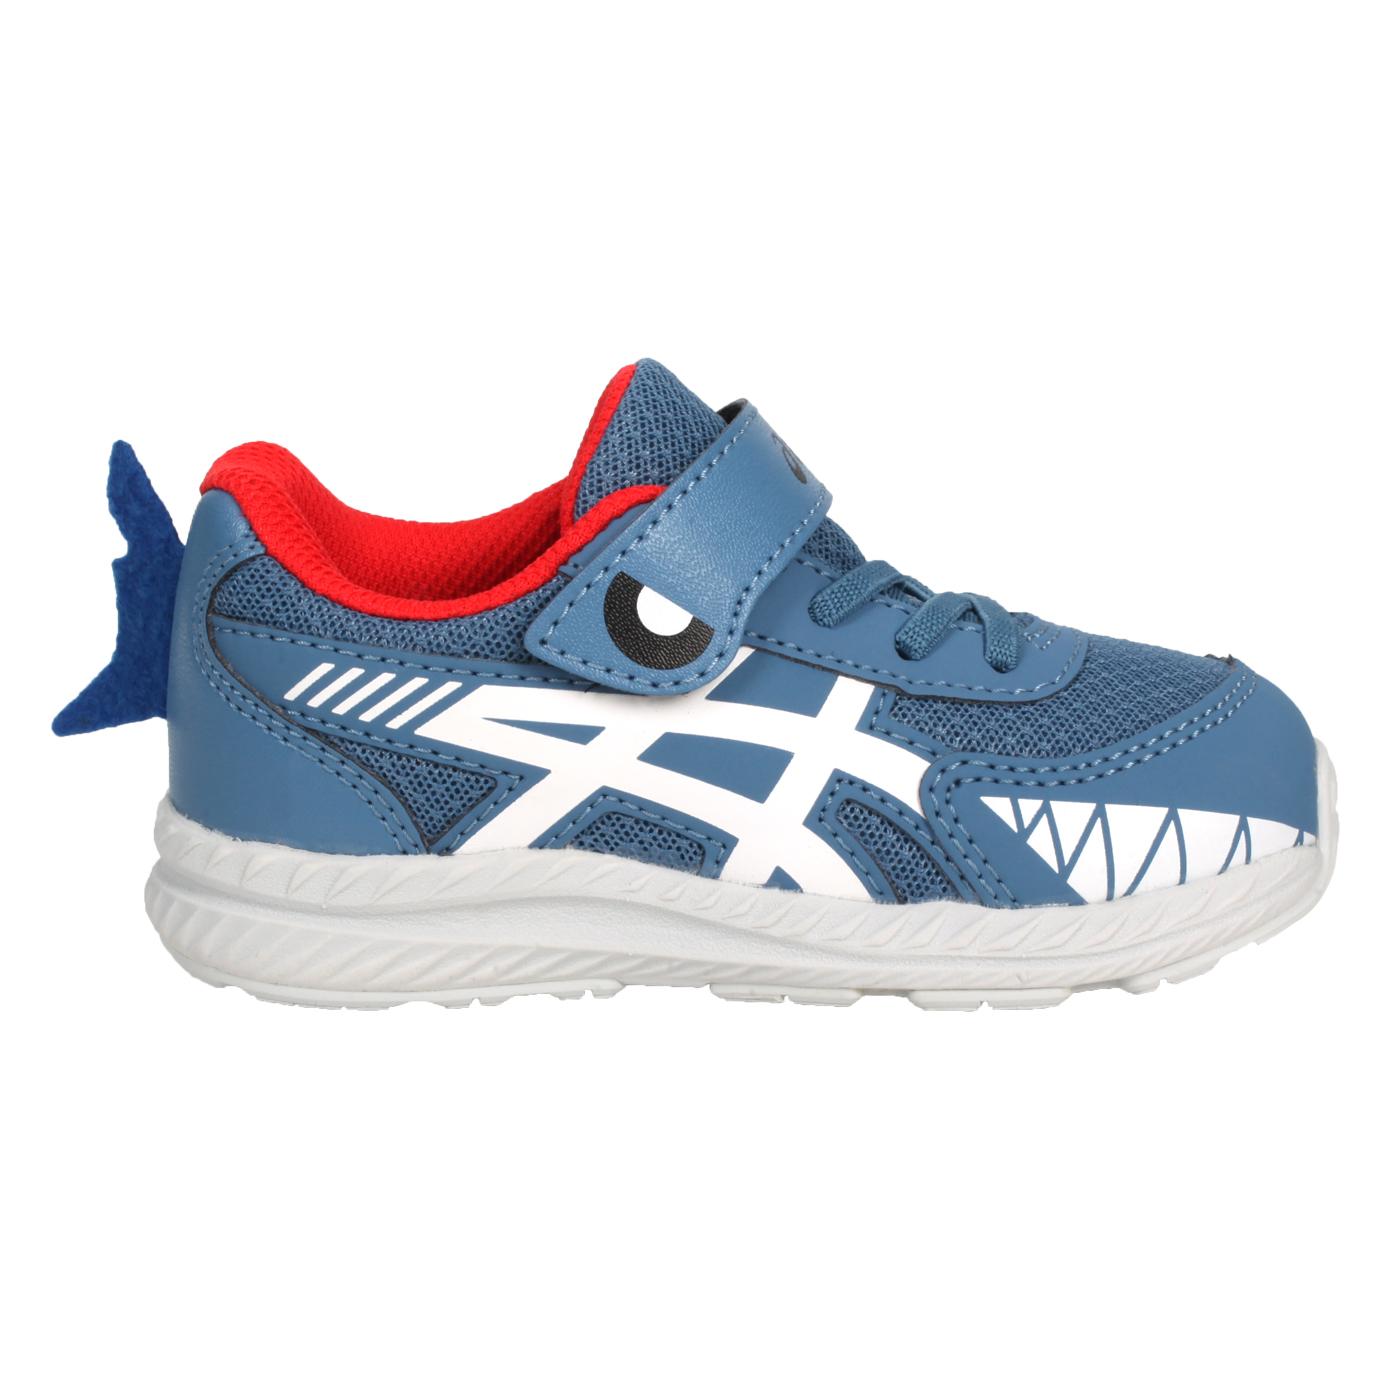 ASICS 小童慢跑鞋  @CONTEND 7 TS SCHOOL YARD@1014A202-404